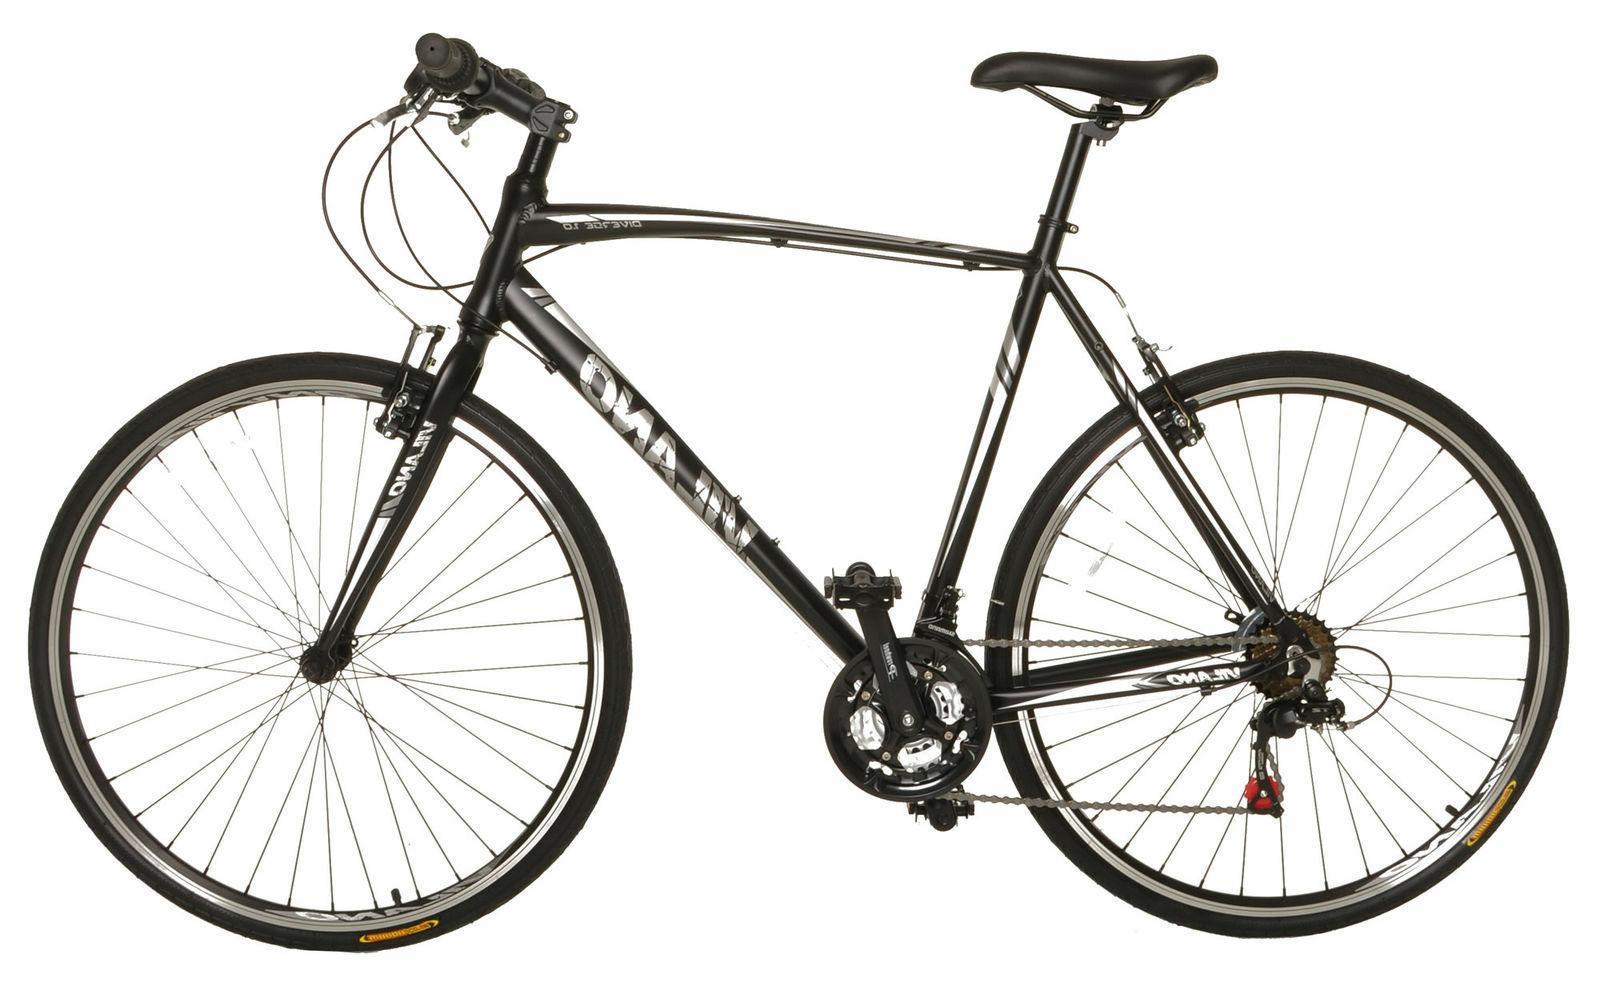 Vilano Diverse Hybrid Bike Shimano Road Bike